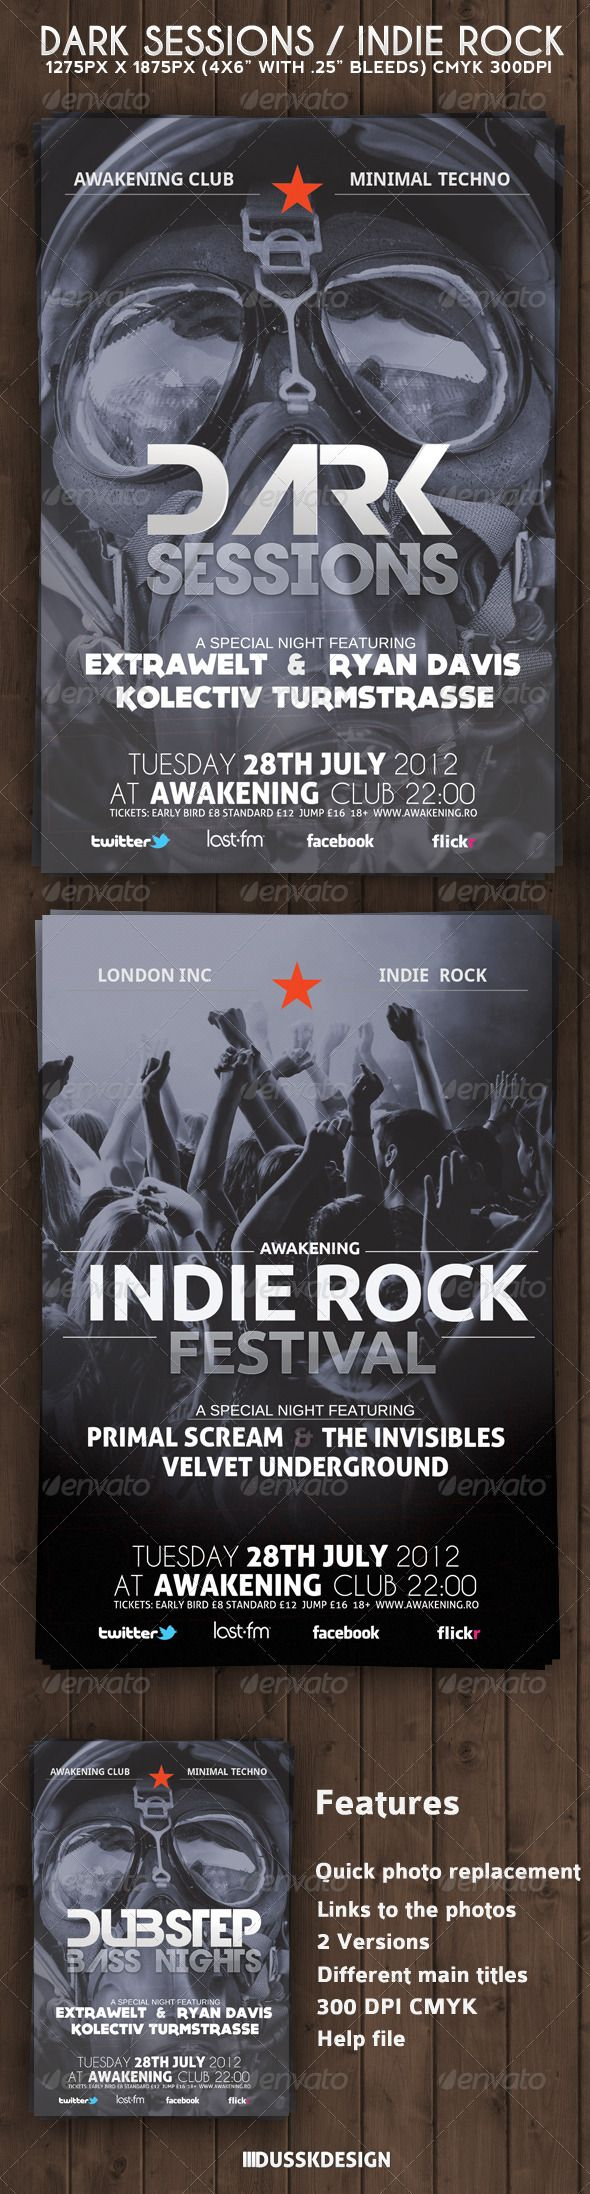 Dark Sessions Indie Rock Flyer